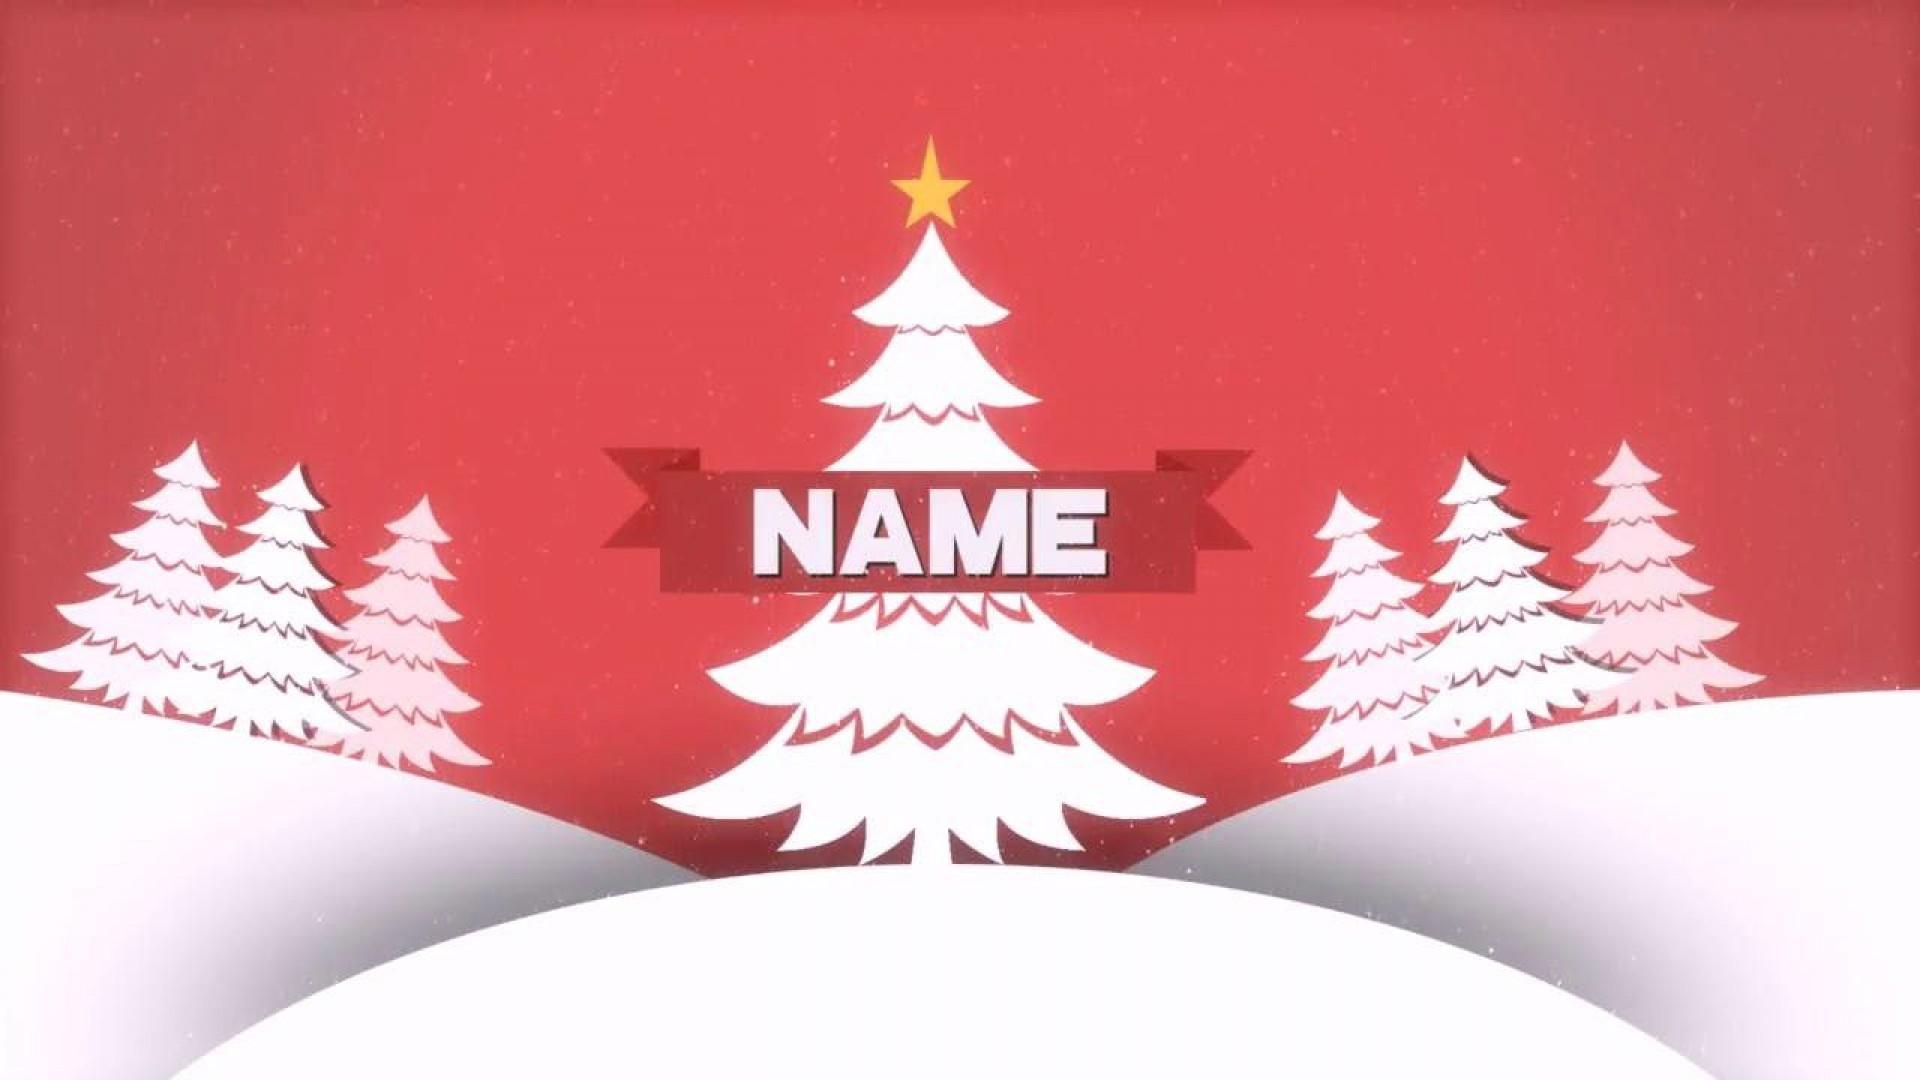 003 Stunning Christma Template Free Download Sample  Word Editable Card Tree1920